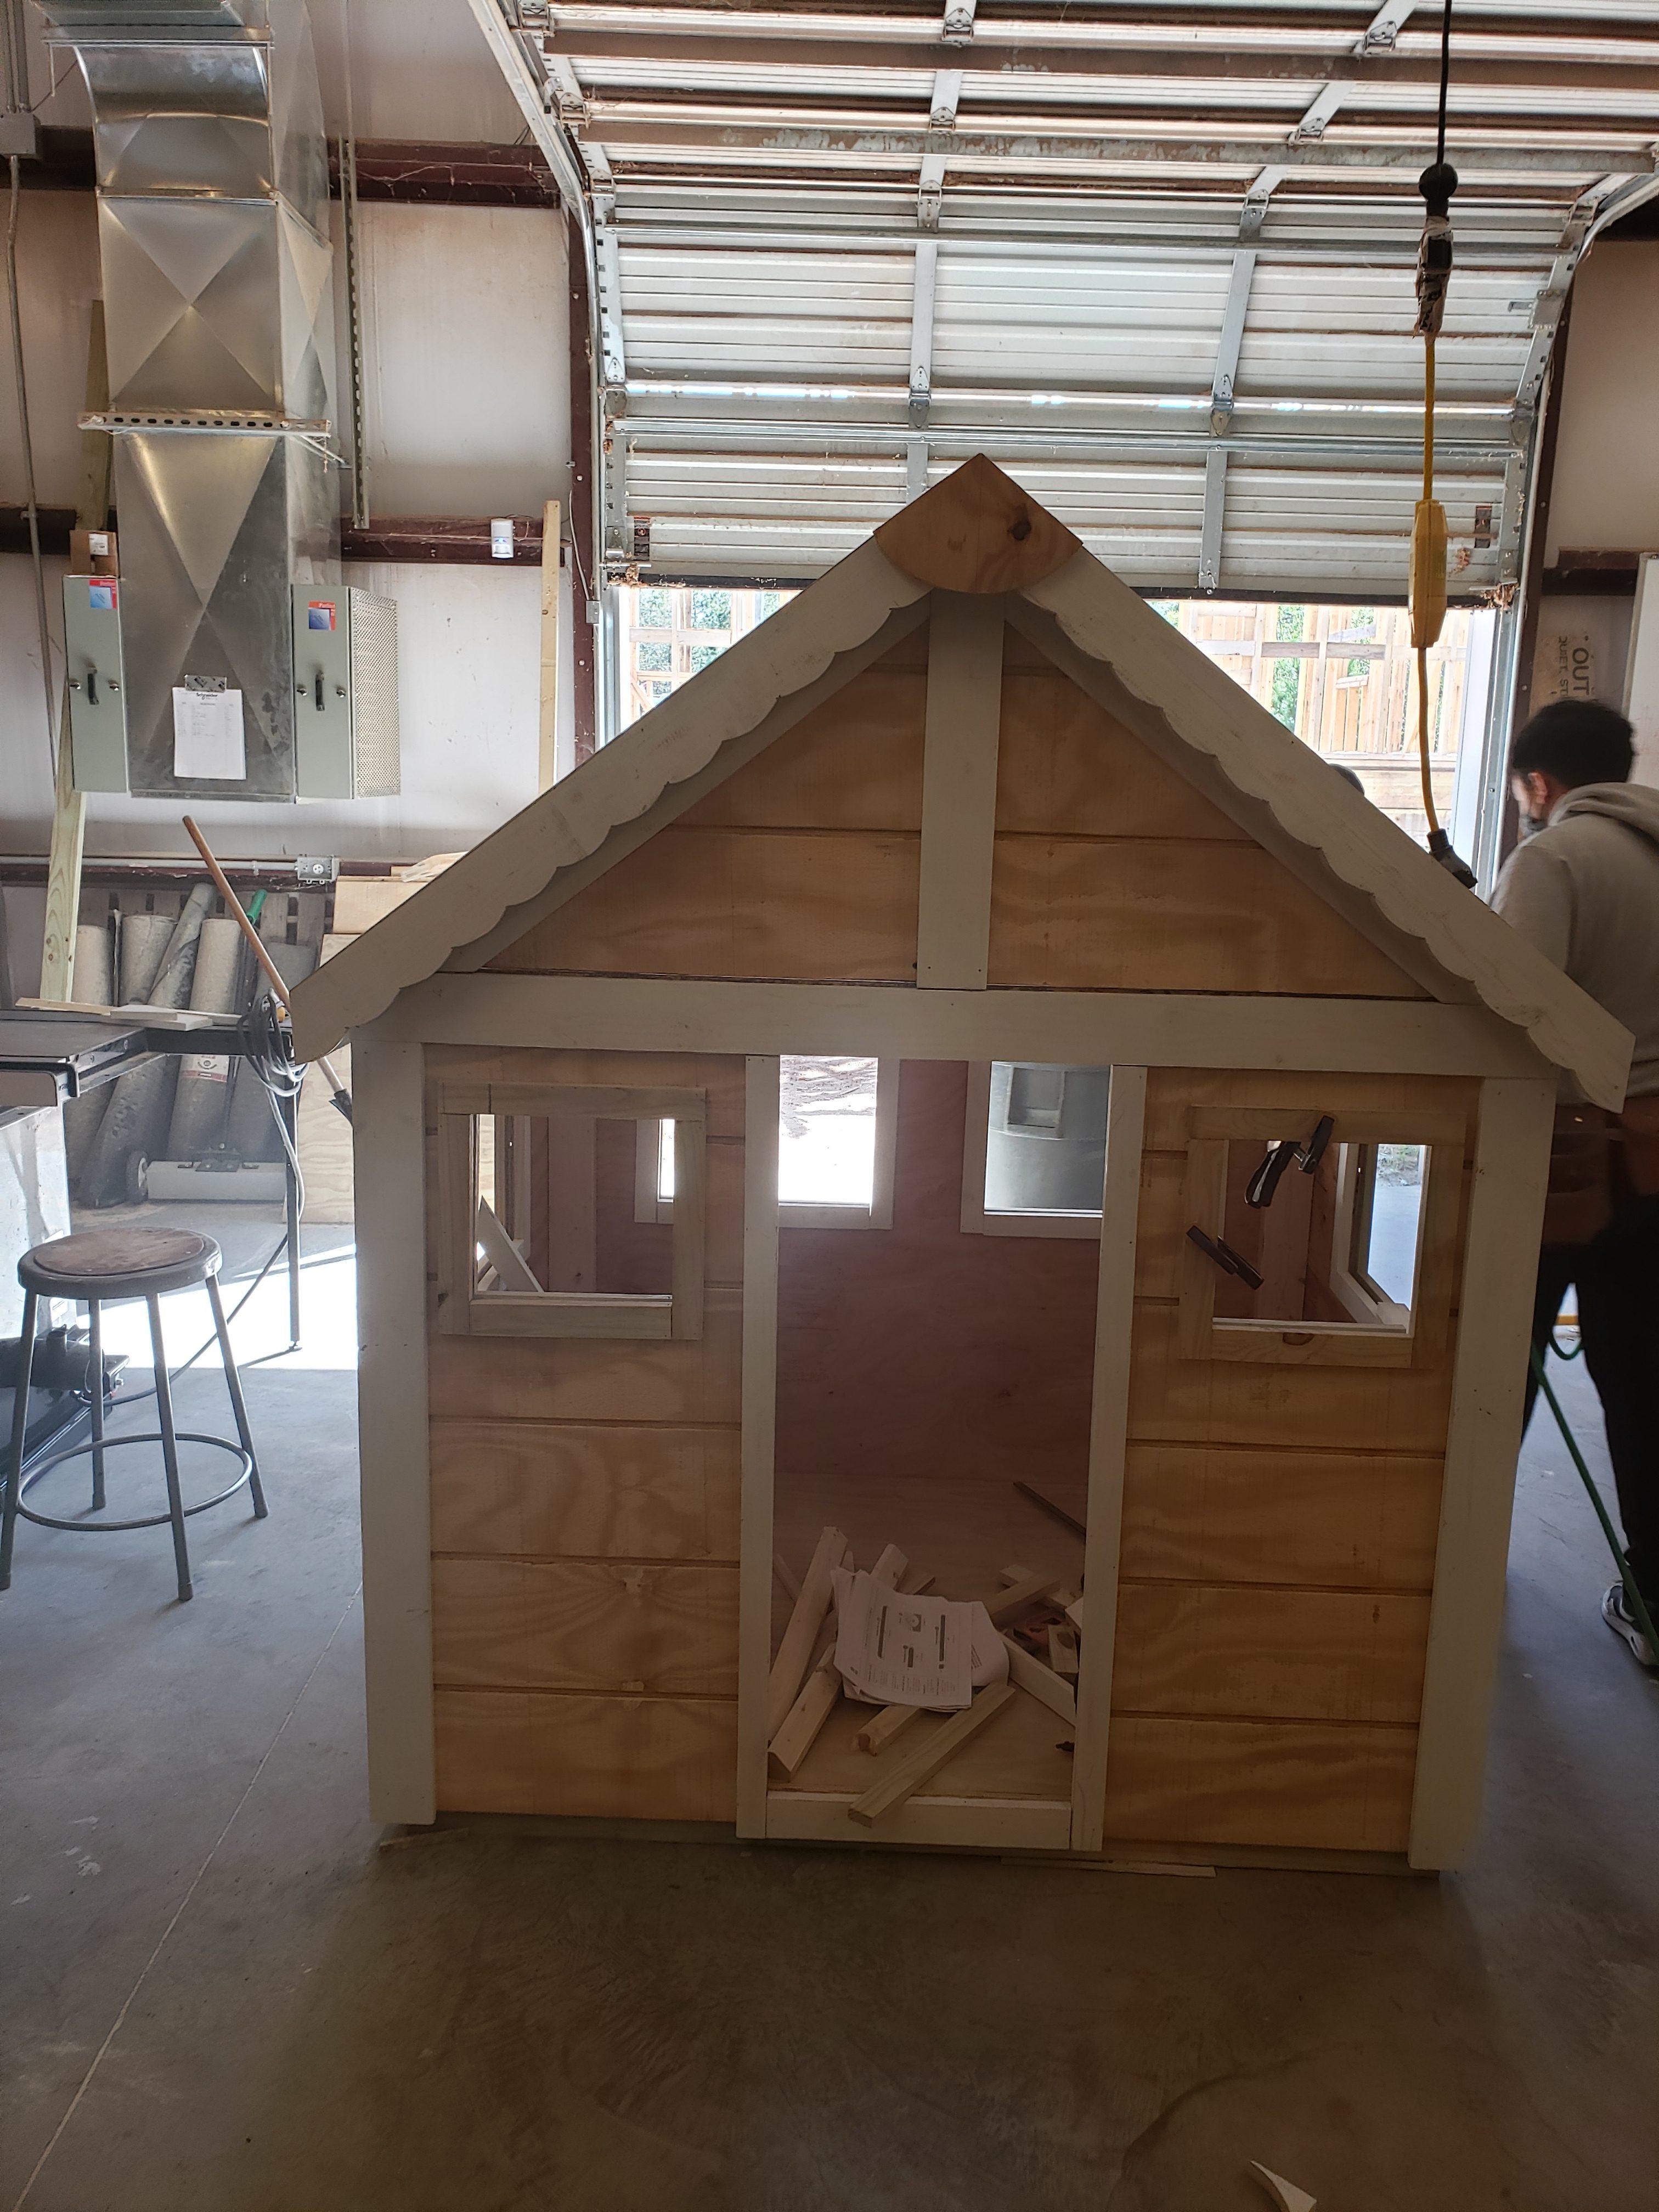 Habitat for Humanity Playhouse